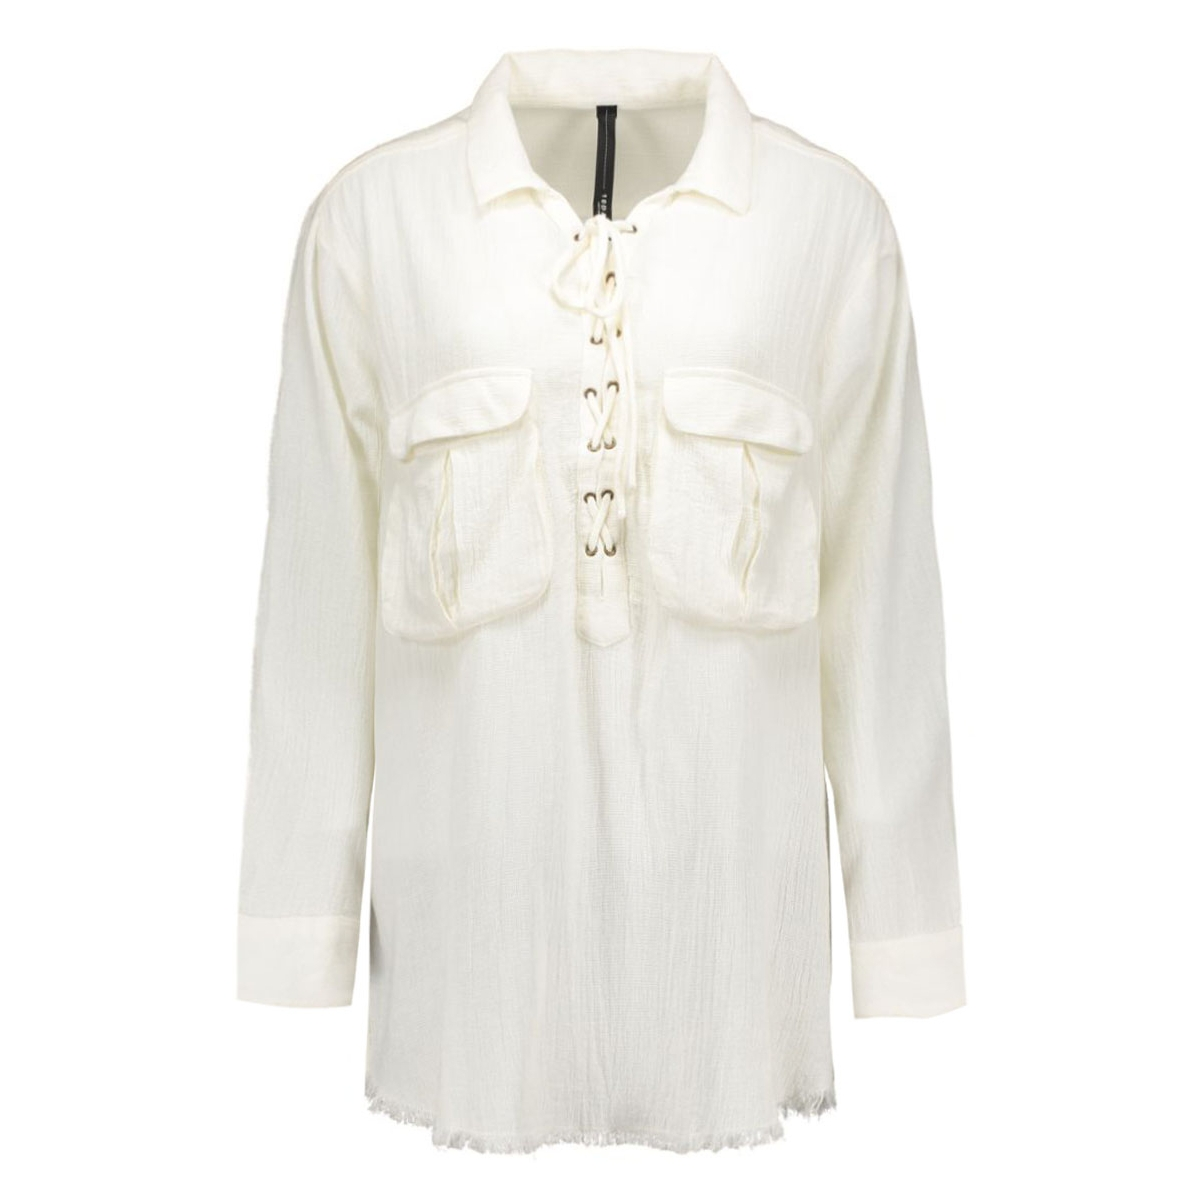 16wi408 10 days blouse ecru